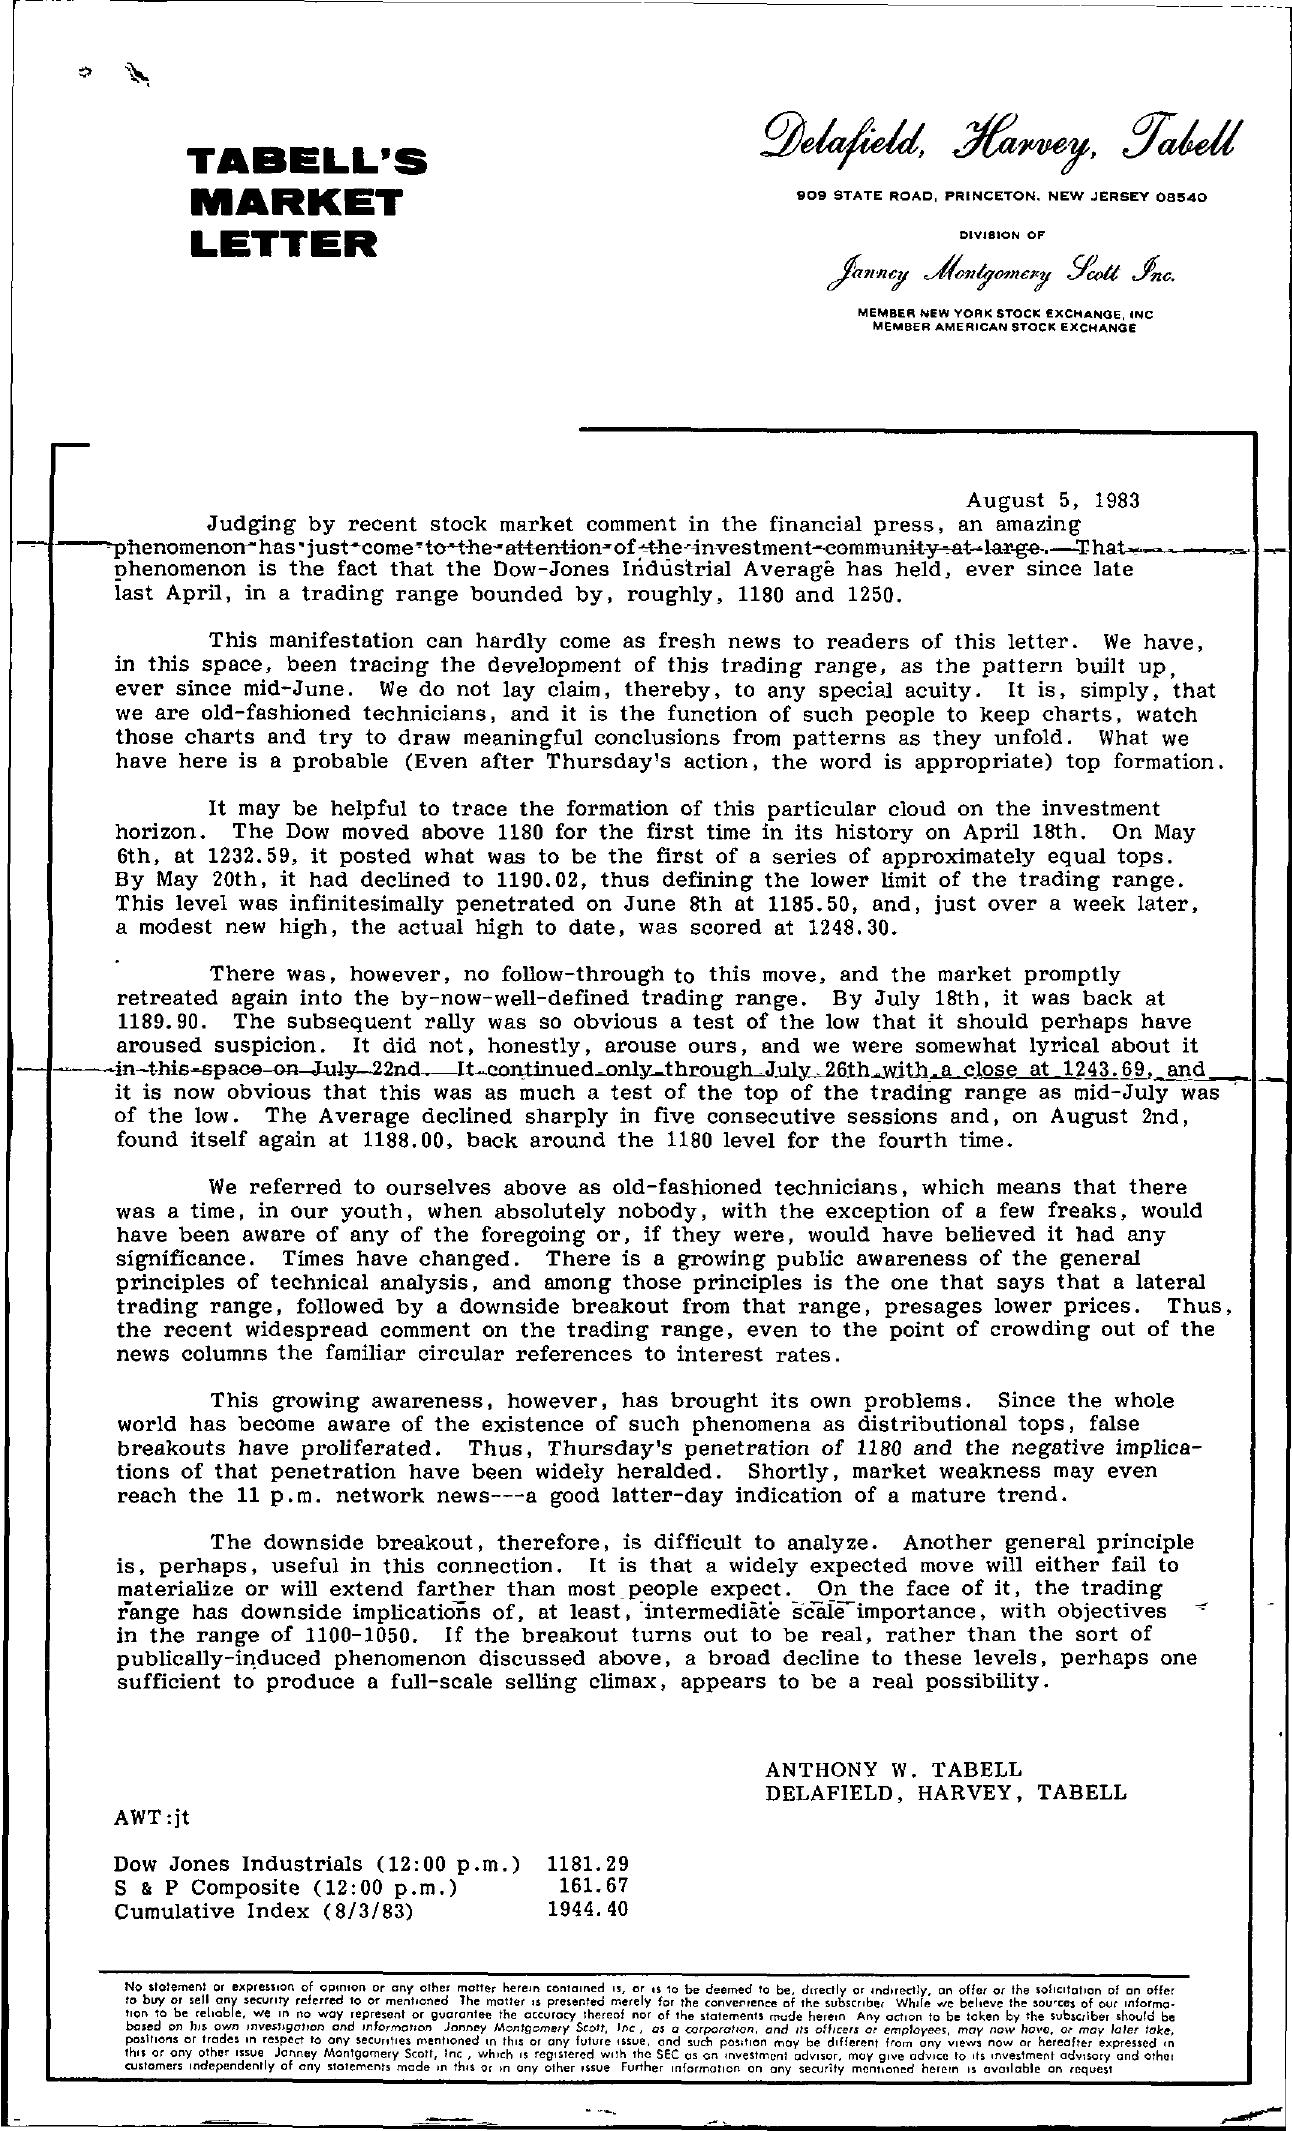 Tabell's Market Letter - August 05, 1983